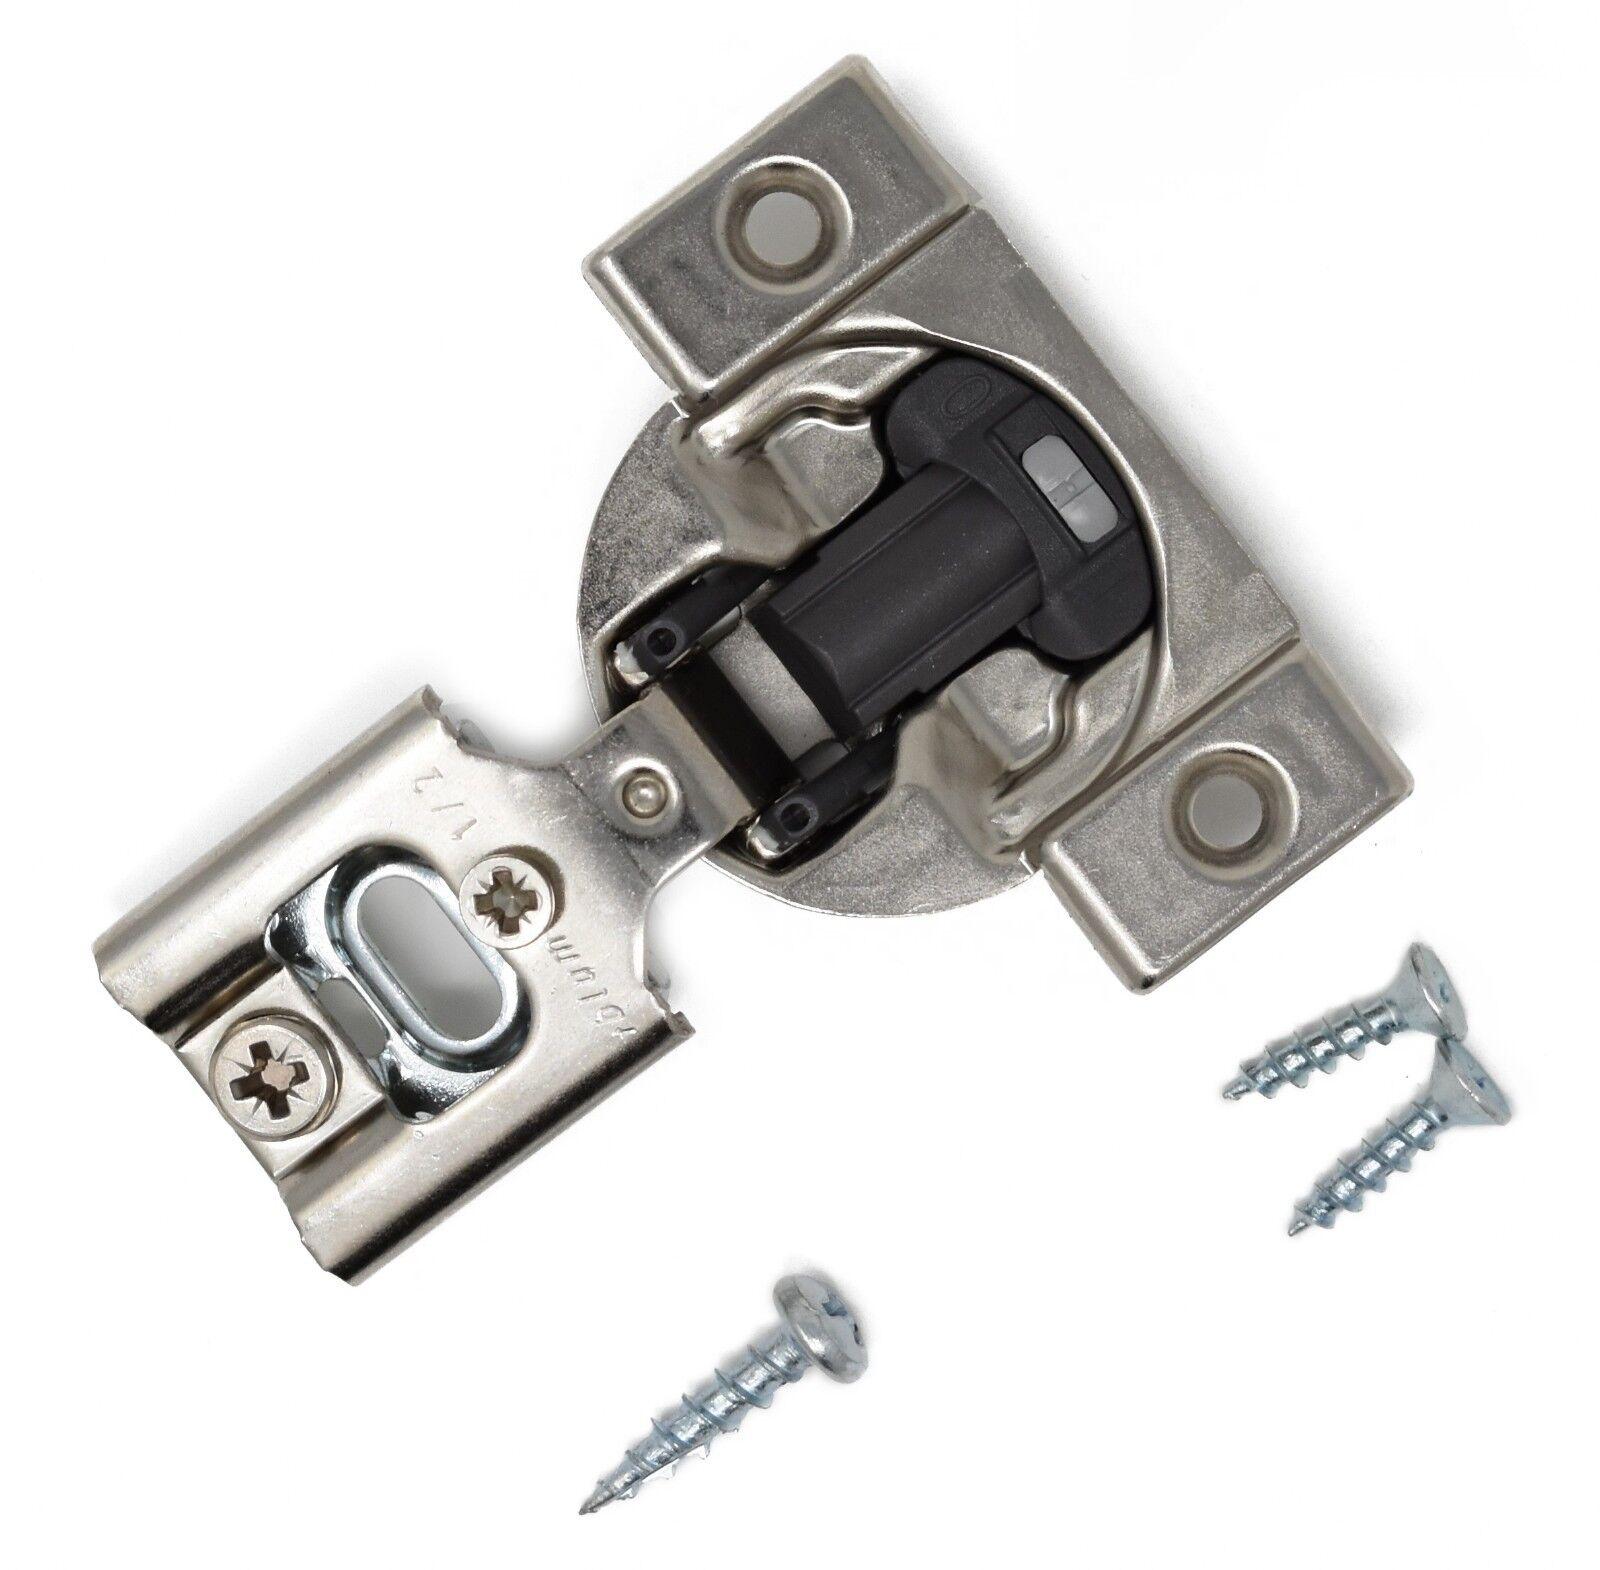 Купить Blum Overlay Blumotion Compact Cabinet Hinge Soft Close Soft-closing 38N/39C